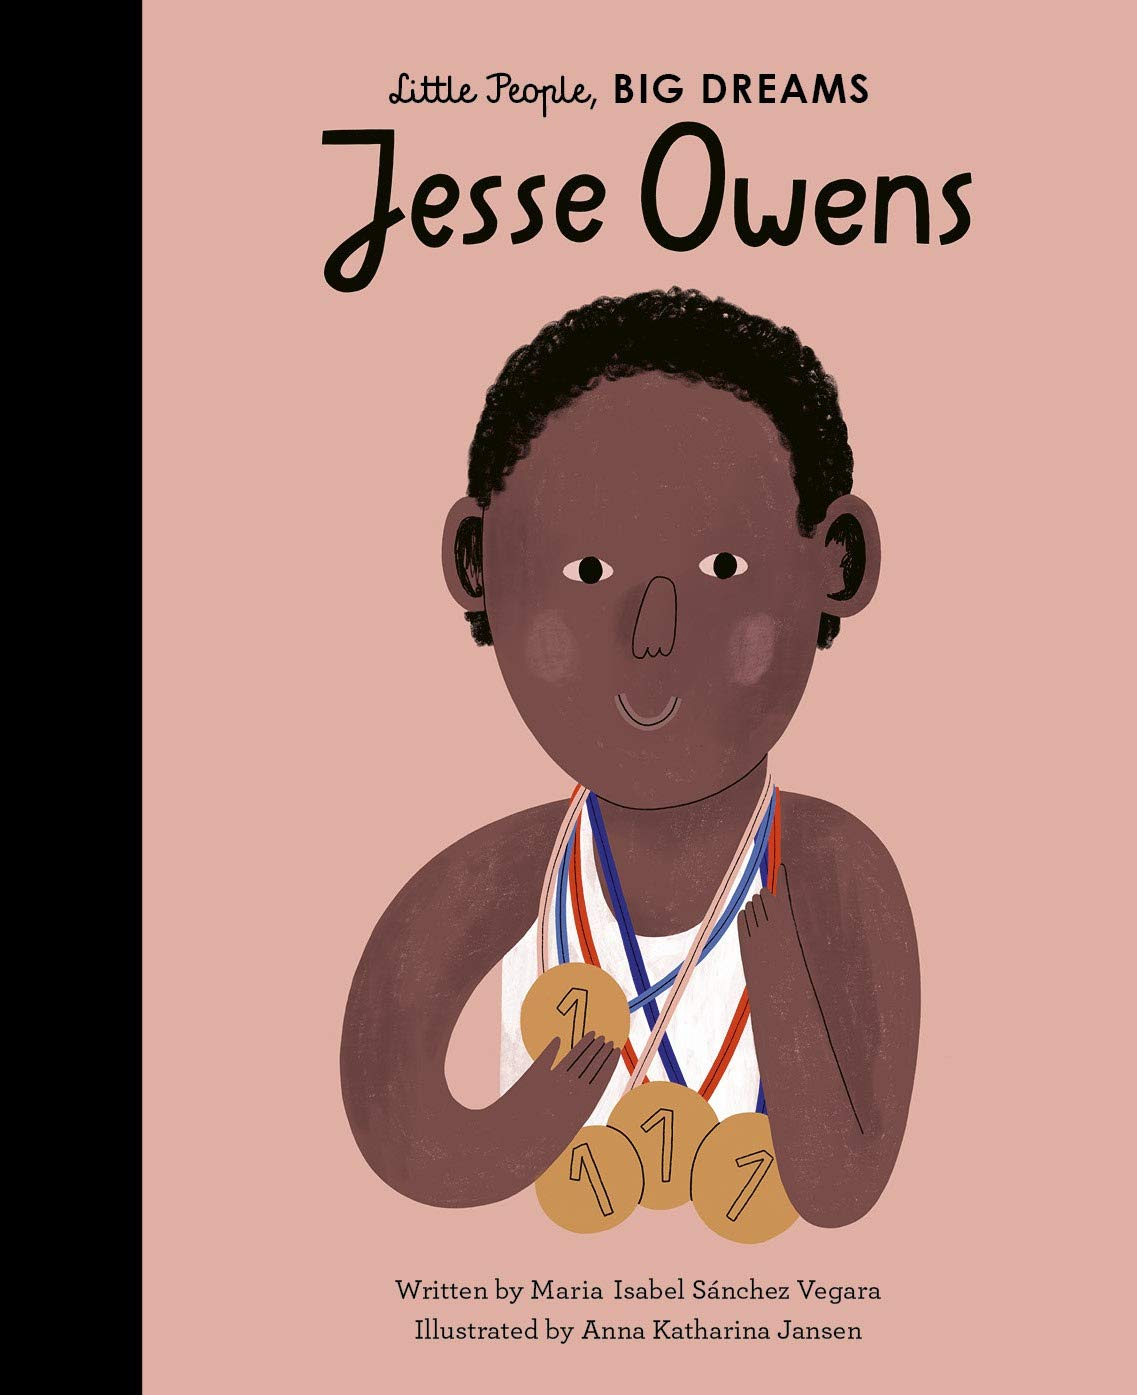 Frances Lincoln Children's Books; New edition (June 2, 2020)